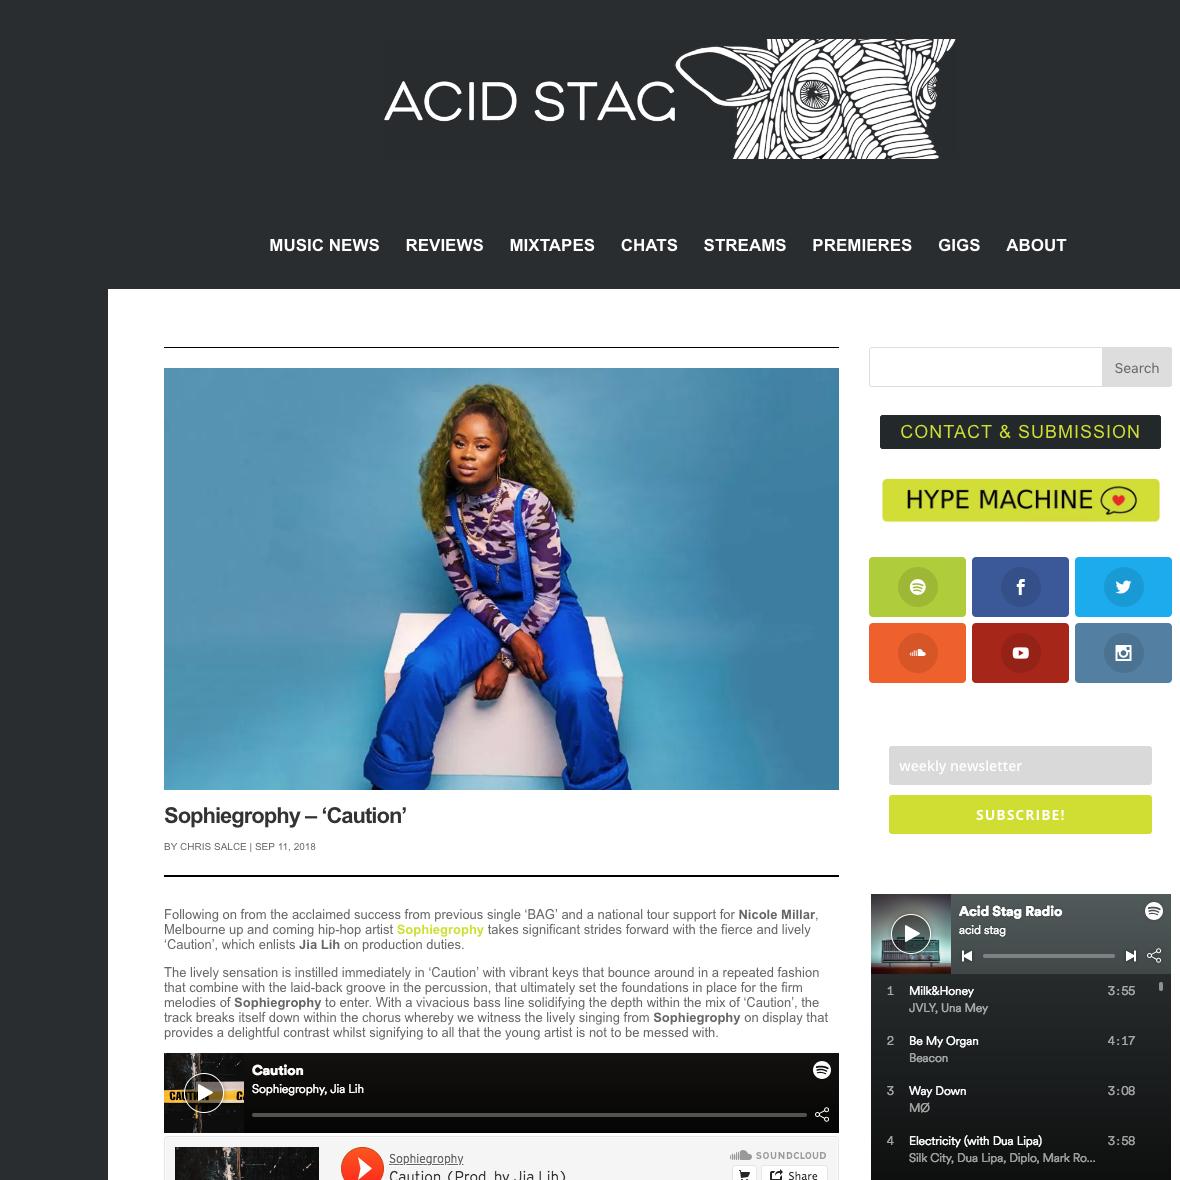 Acid Stag - September 11th 2018